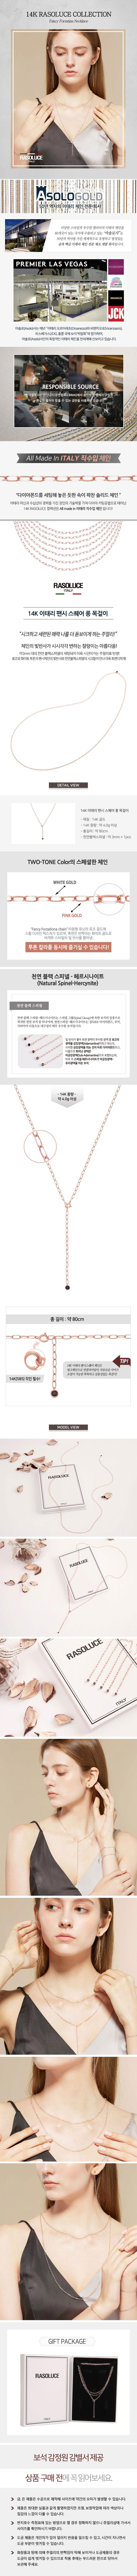 14K-팬시체인_목걸이80cm-웹기.jpg